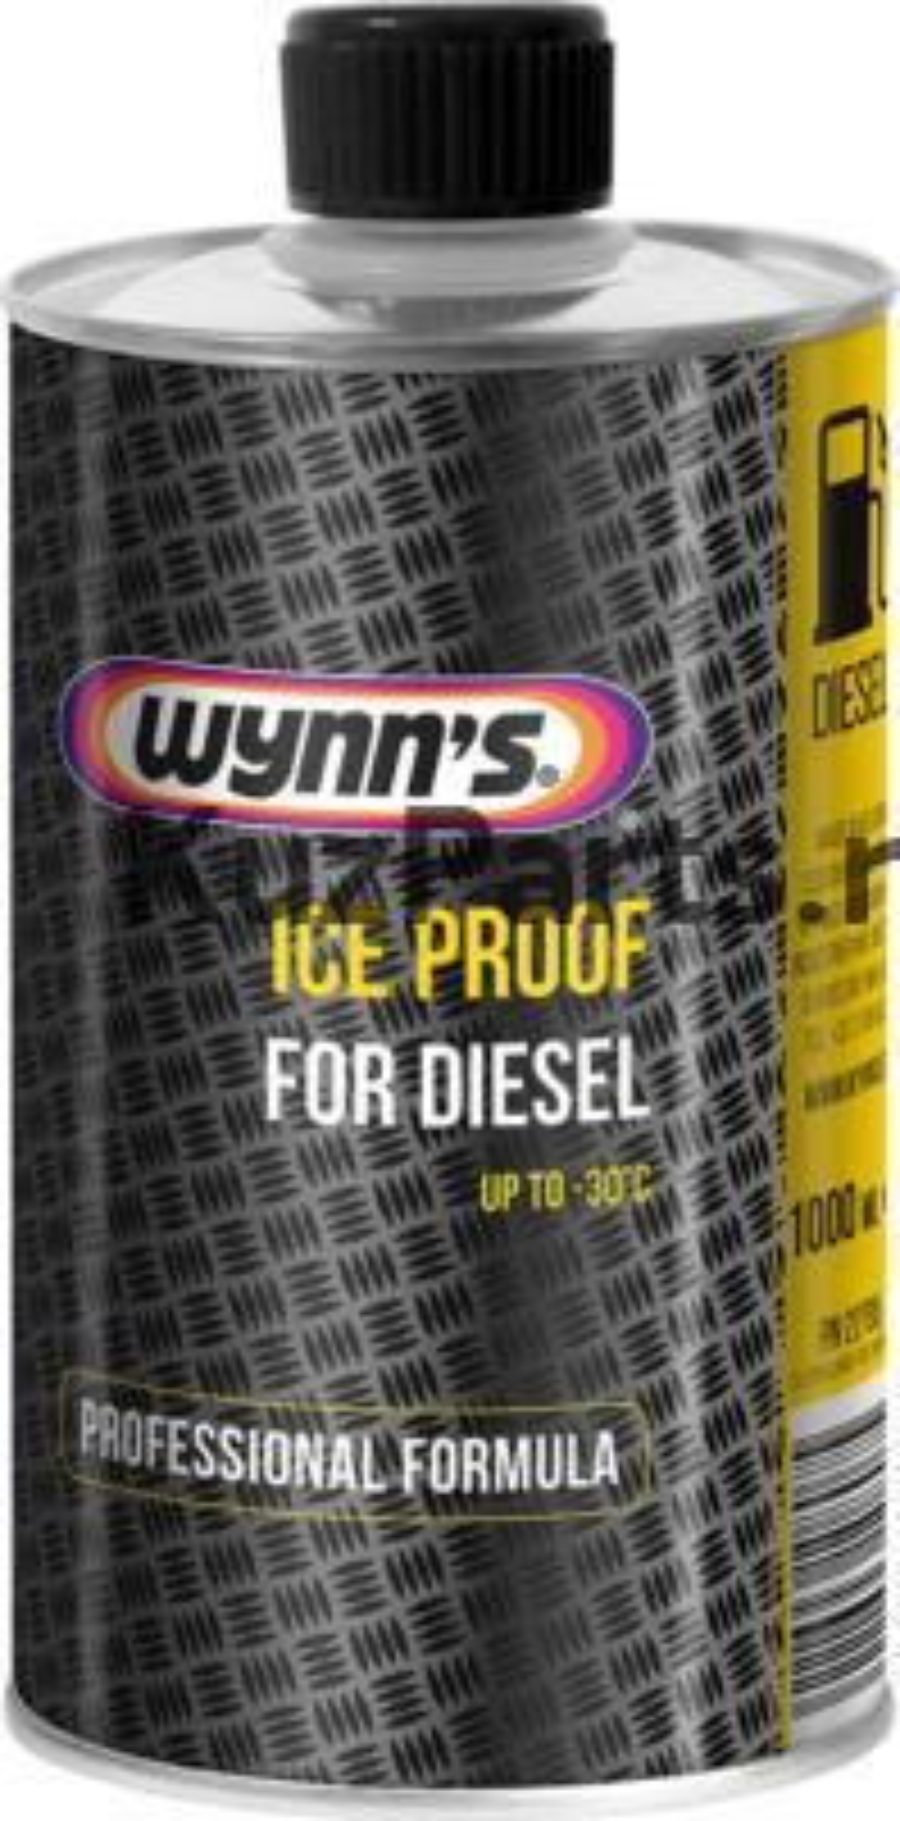 Ice Proof for Diesel (антигель для дизельного топлива, концентрат) 1L PN22795